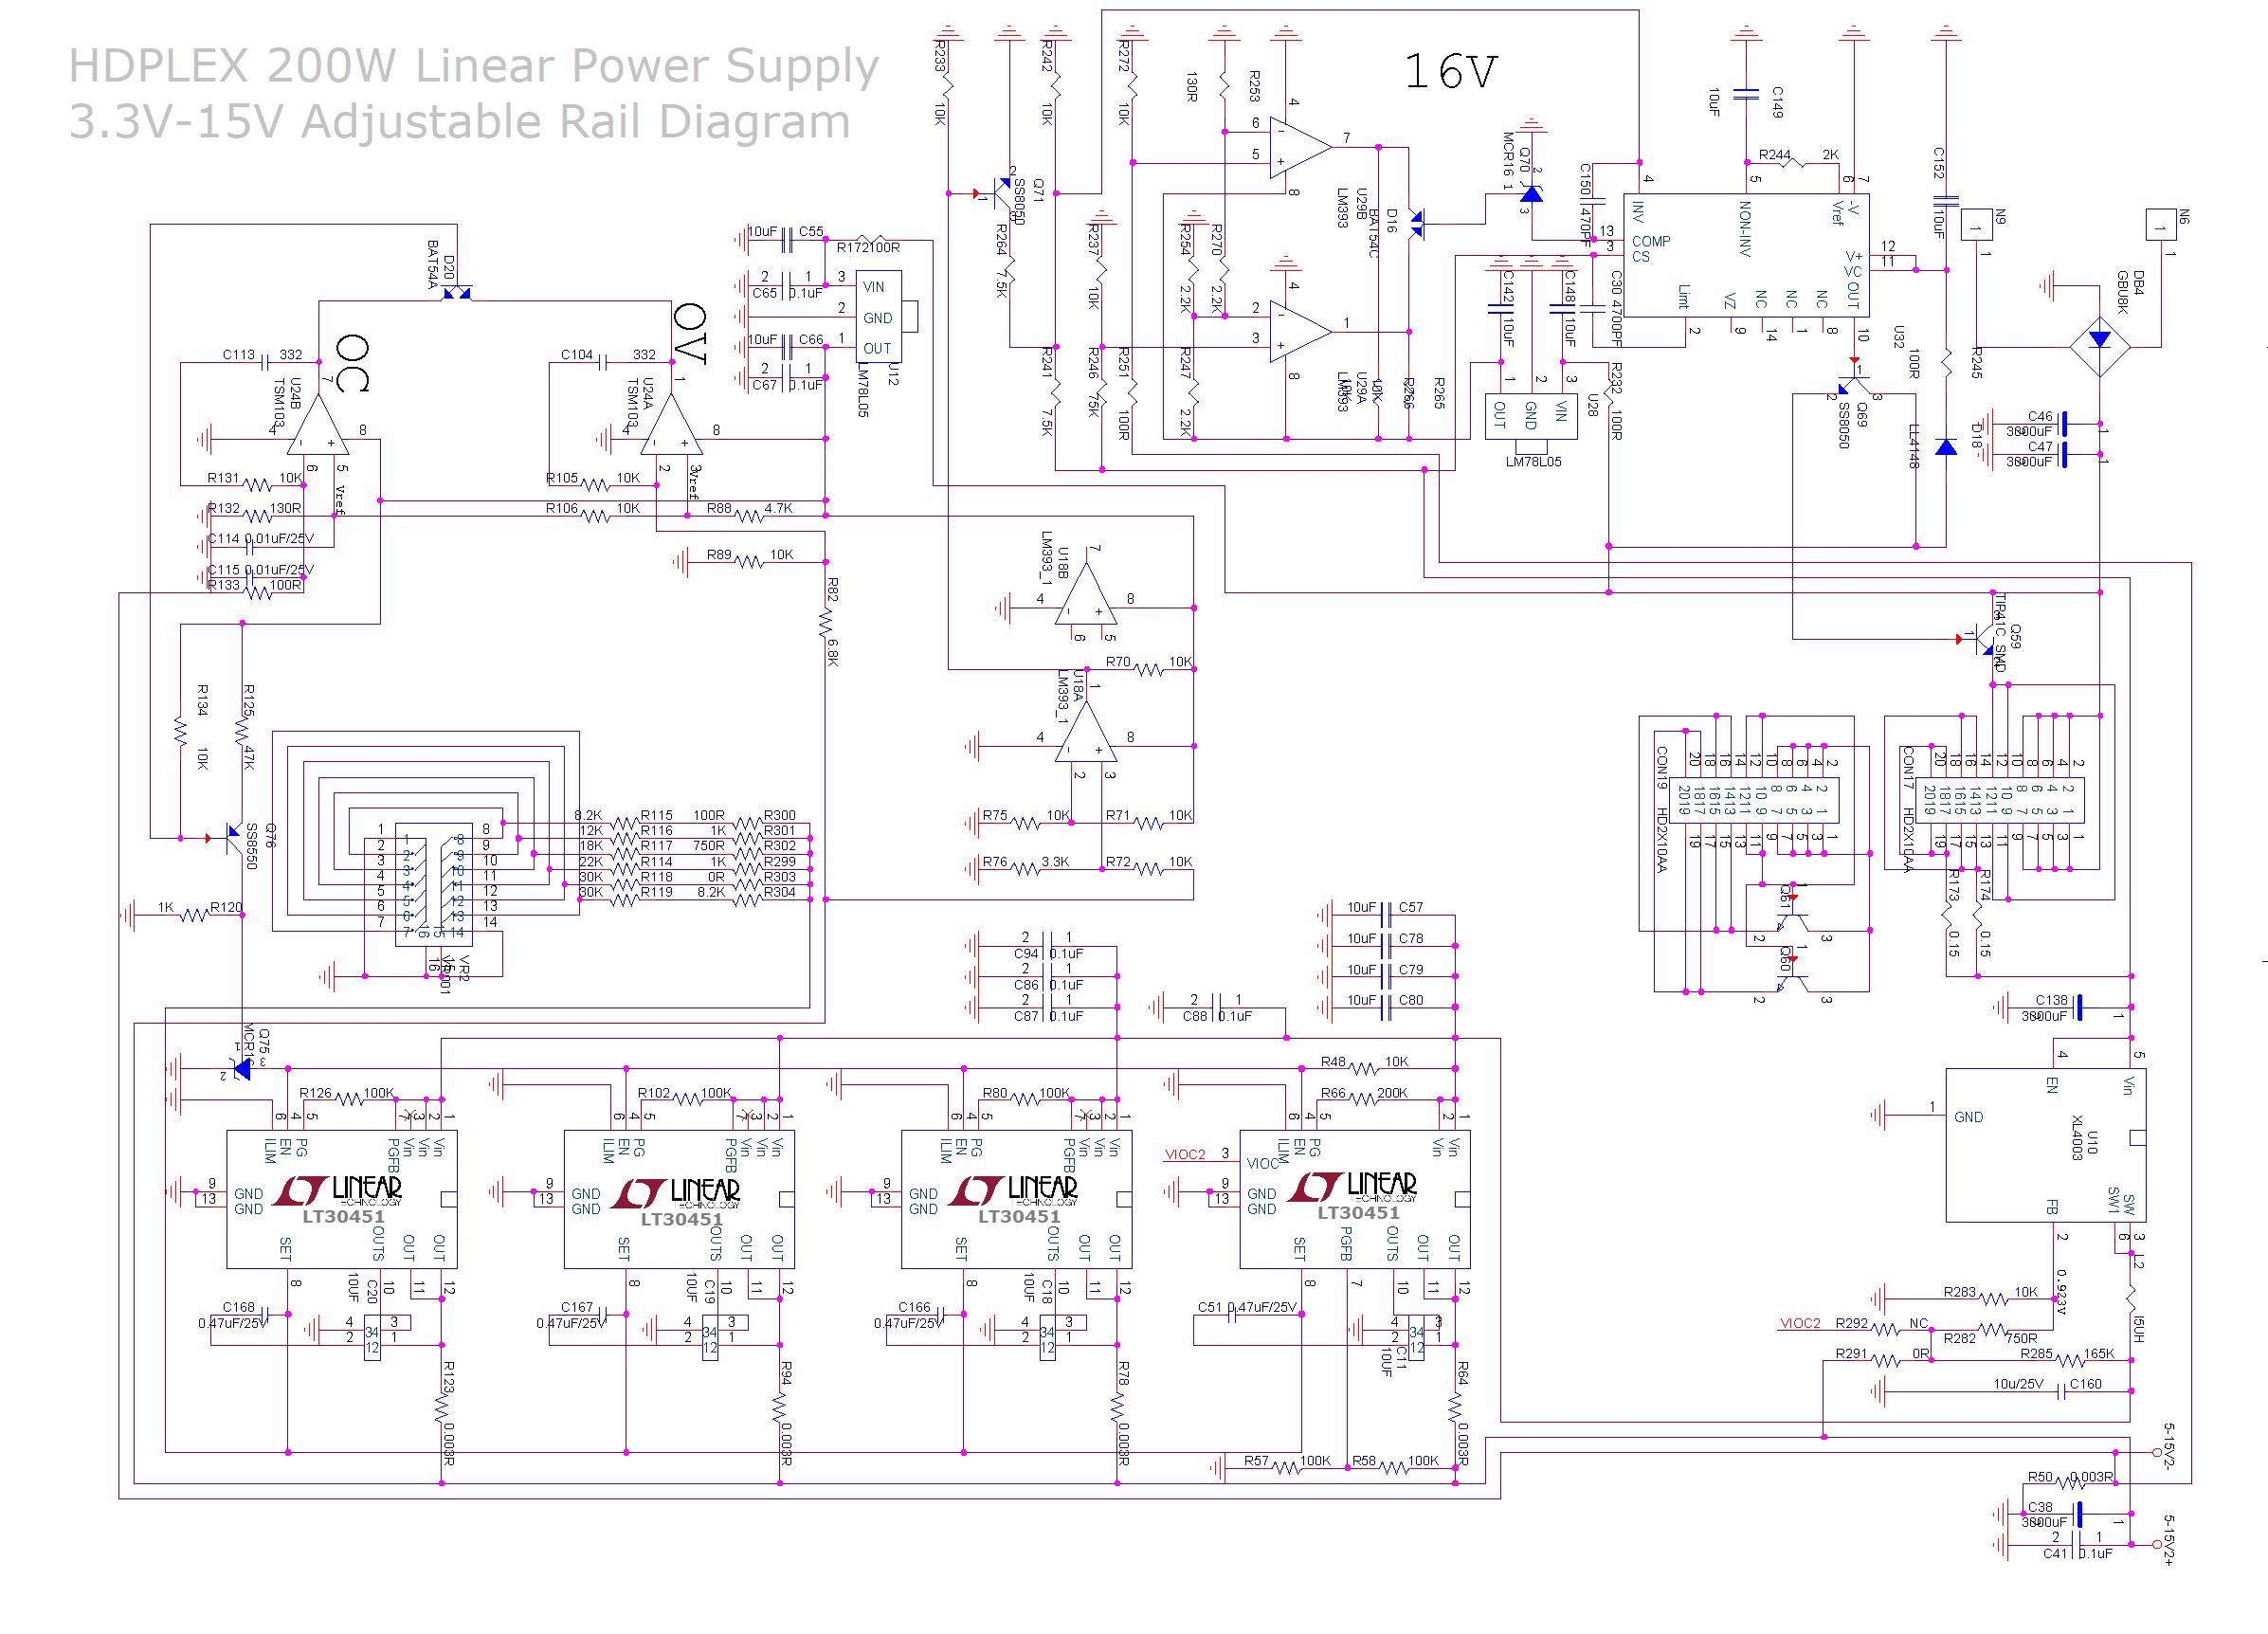 HDPLEX 200W Linear Power Supply Multi Rail Output on